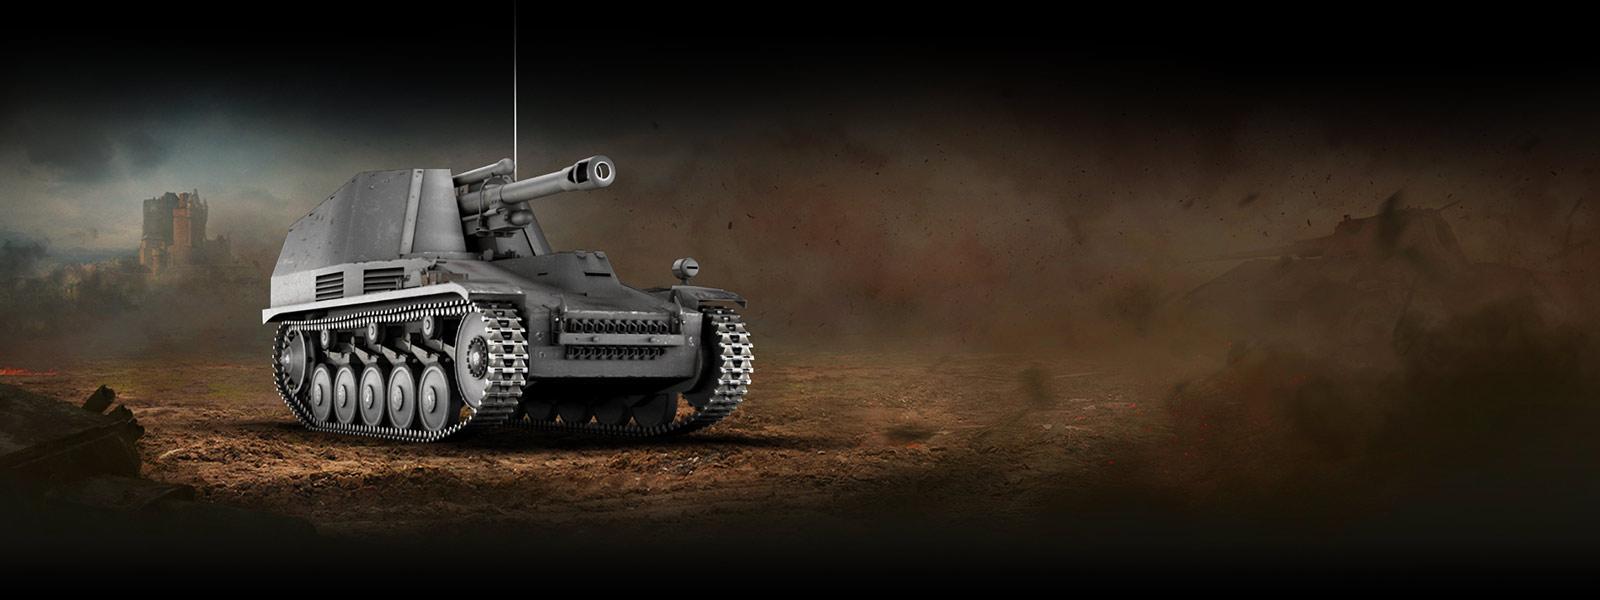 Czołg artyleryjski